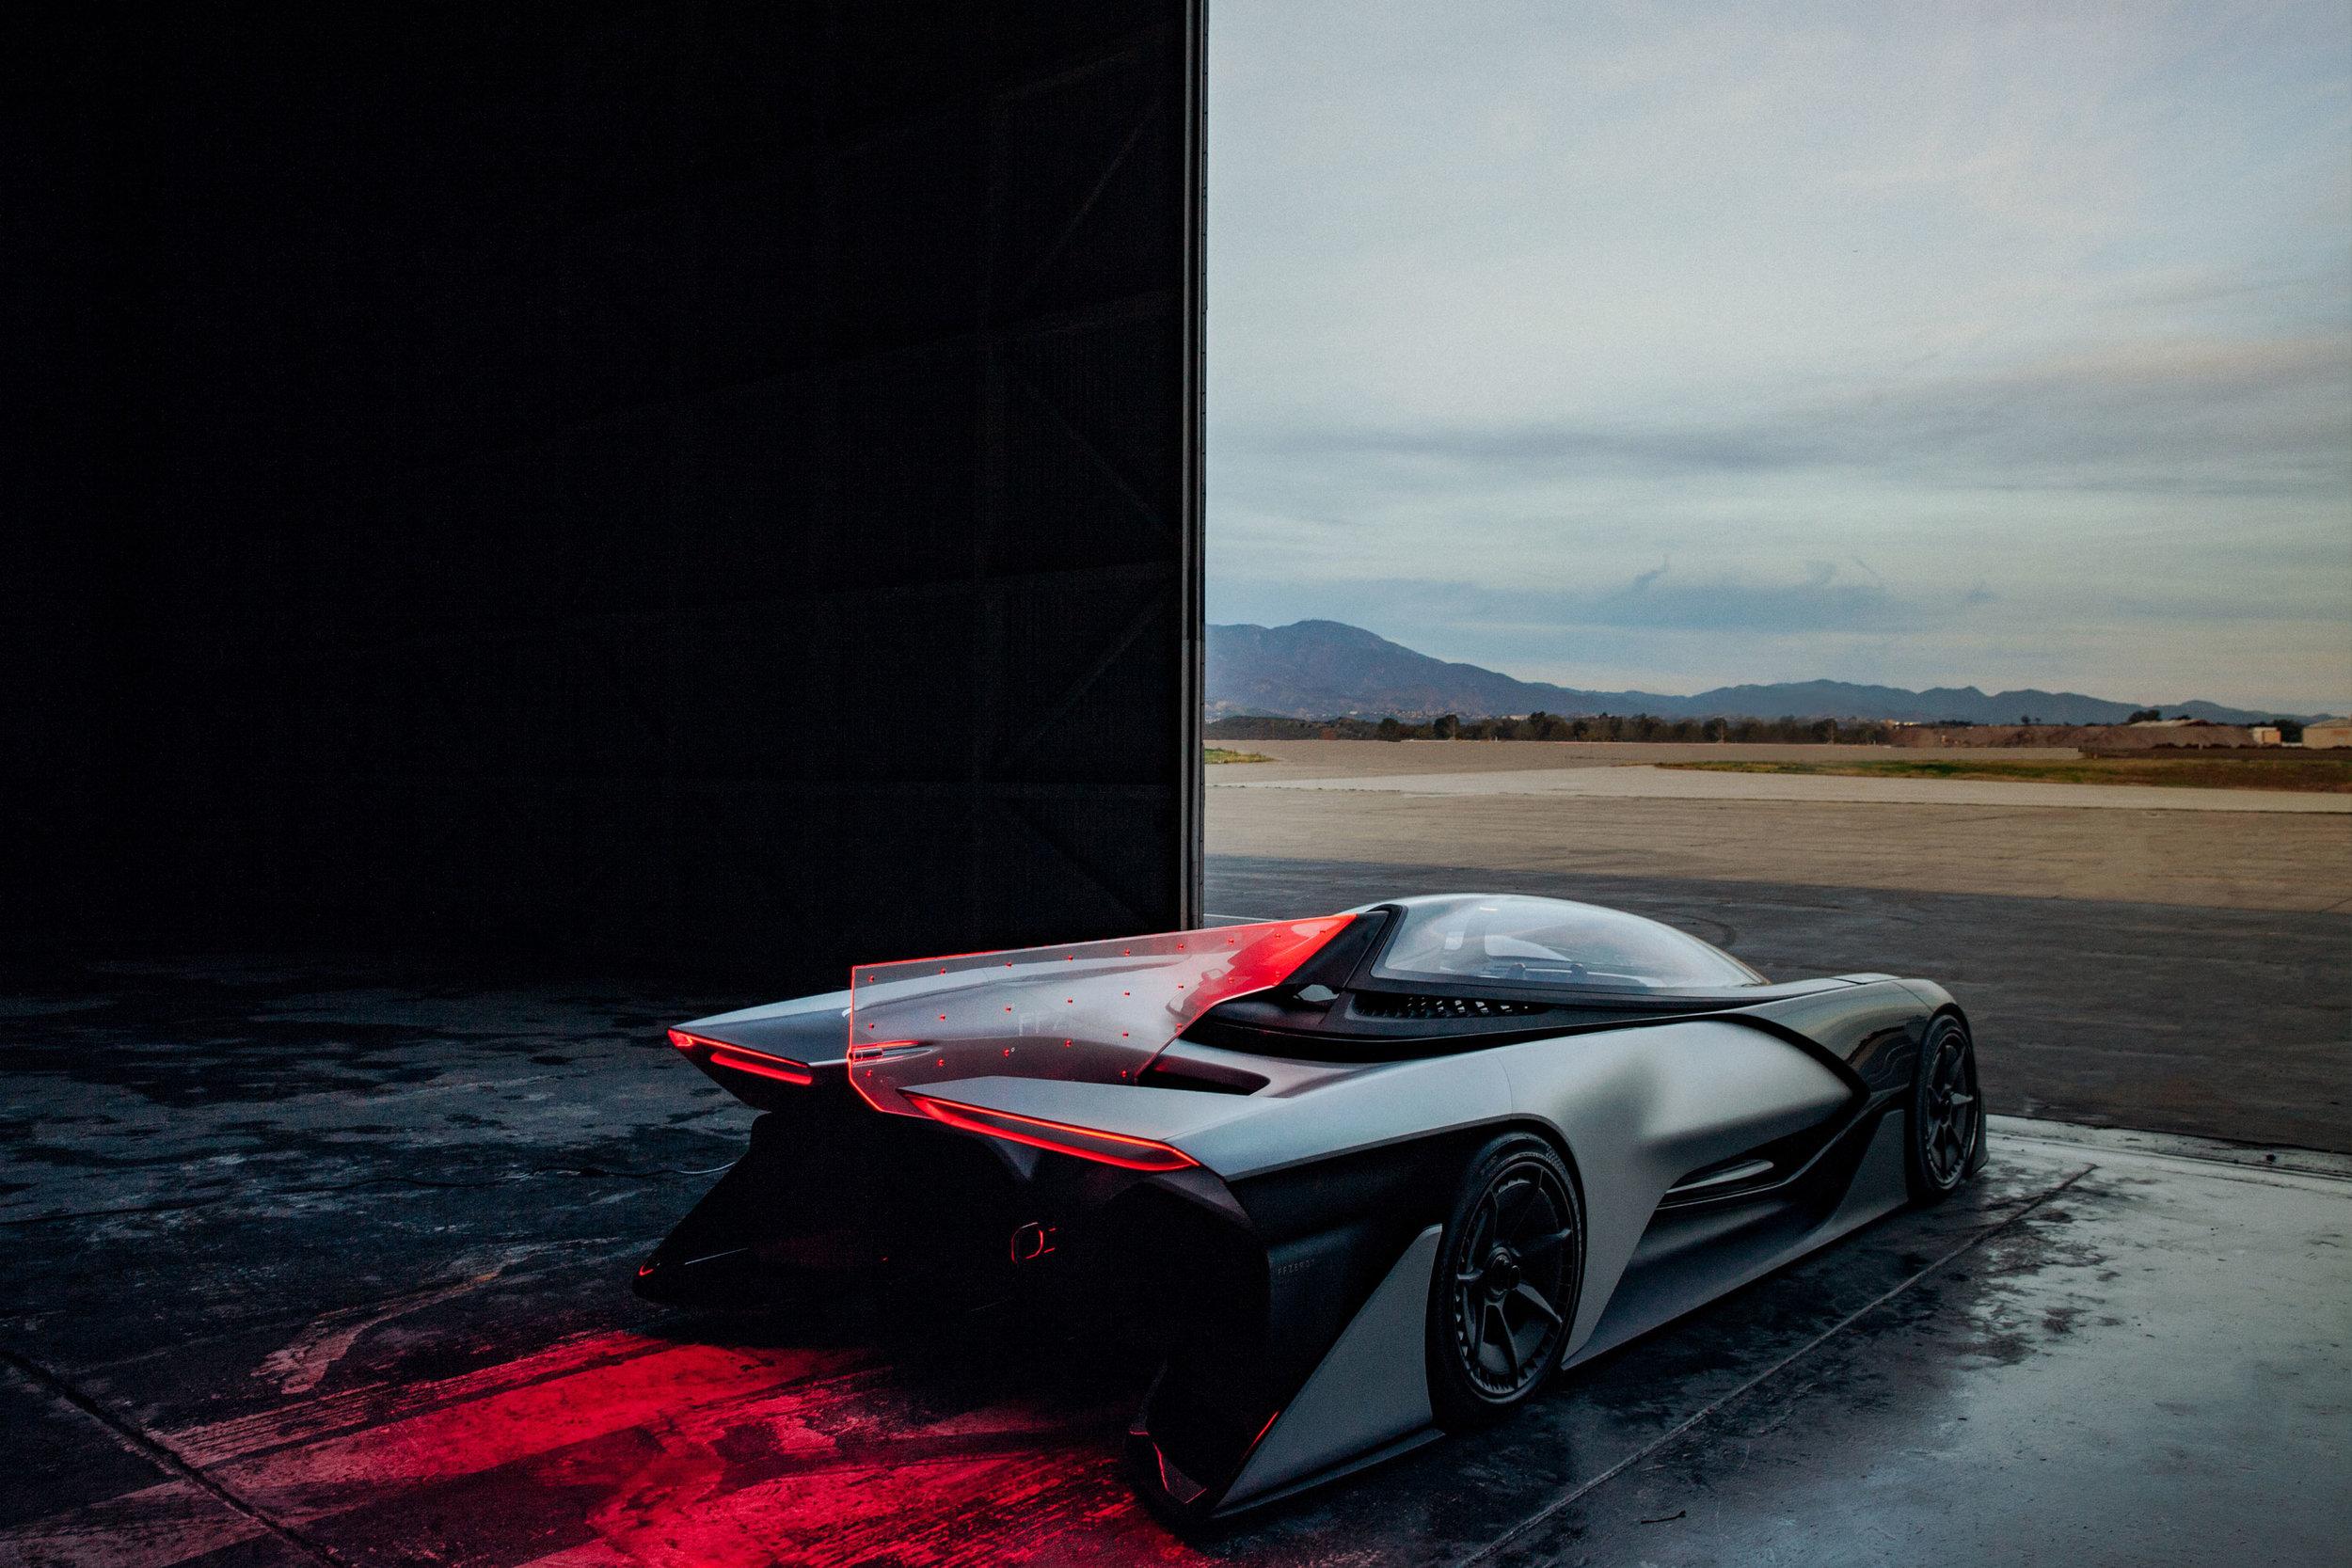 ff-zero-1-concept-car-air-plane-hangar-rear-image-02.jpg